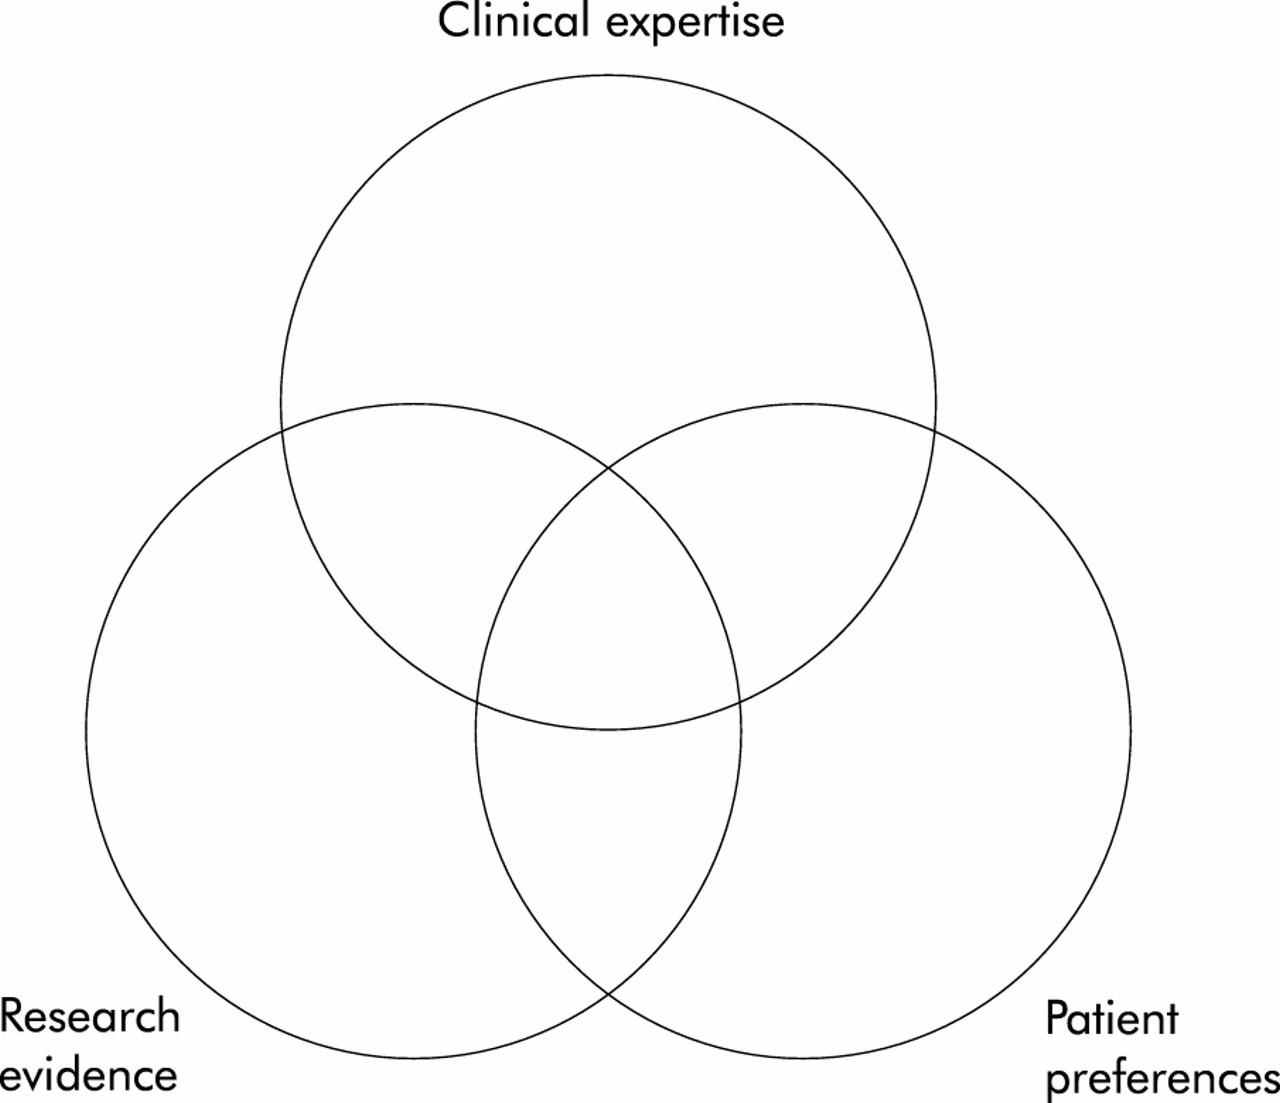 understanding nursing research building an evidencebased practice 7e